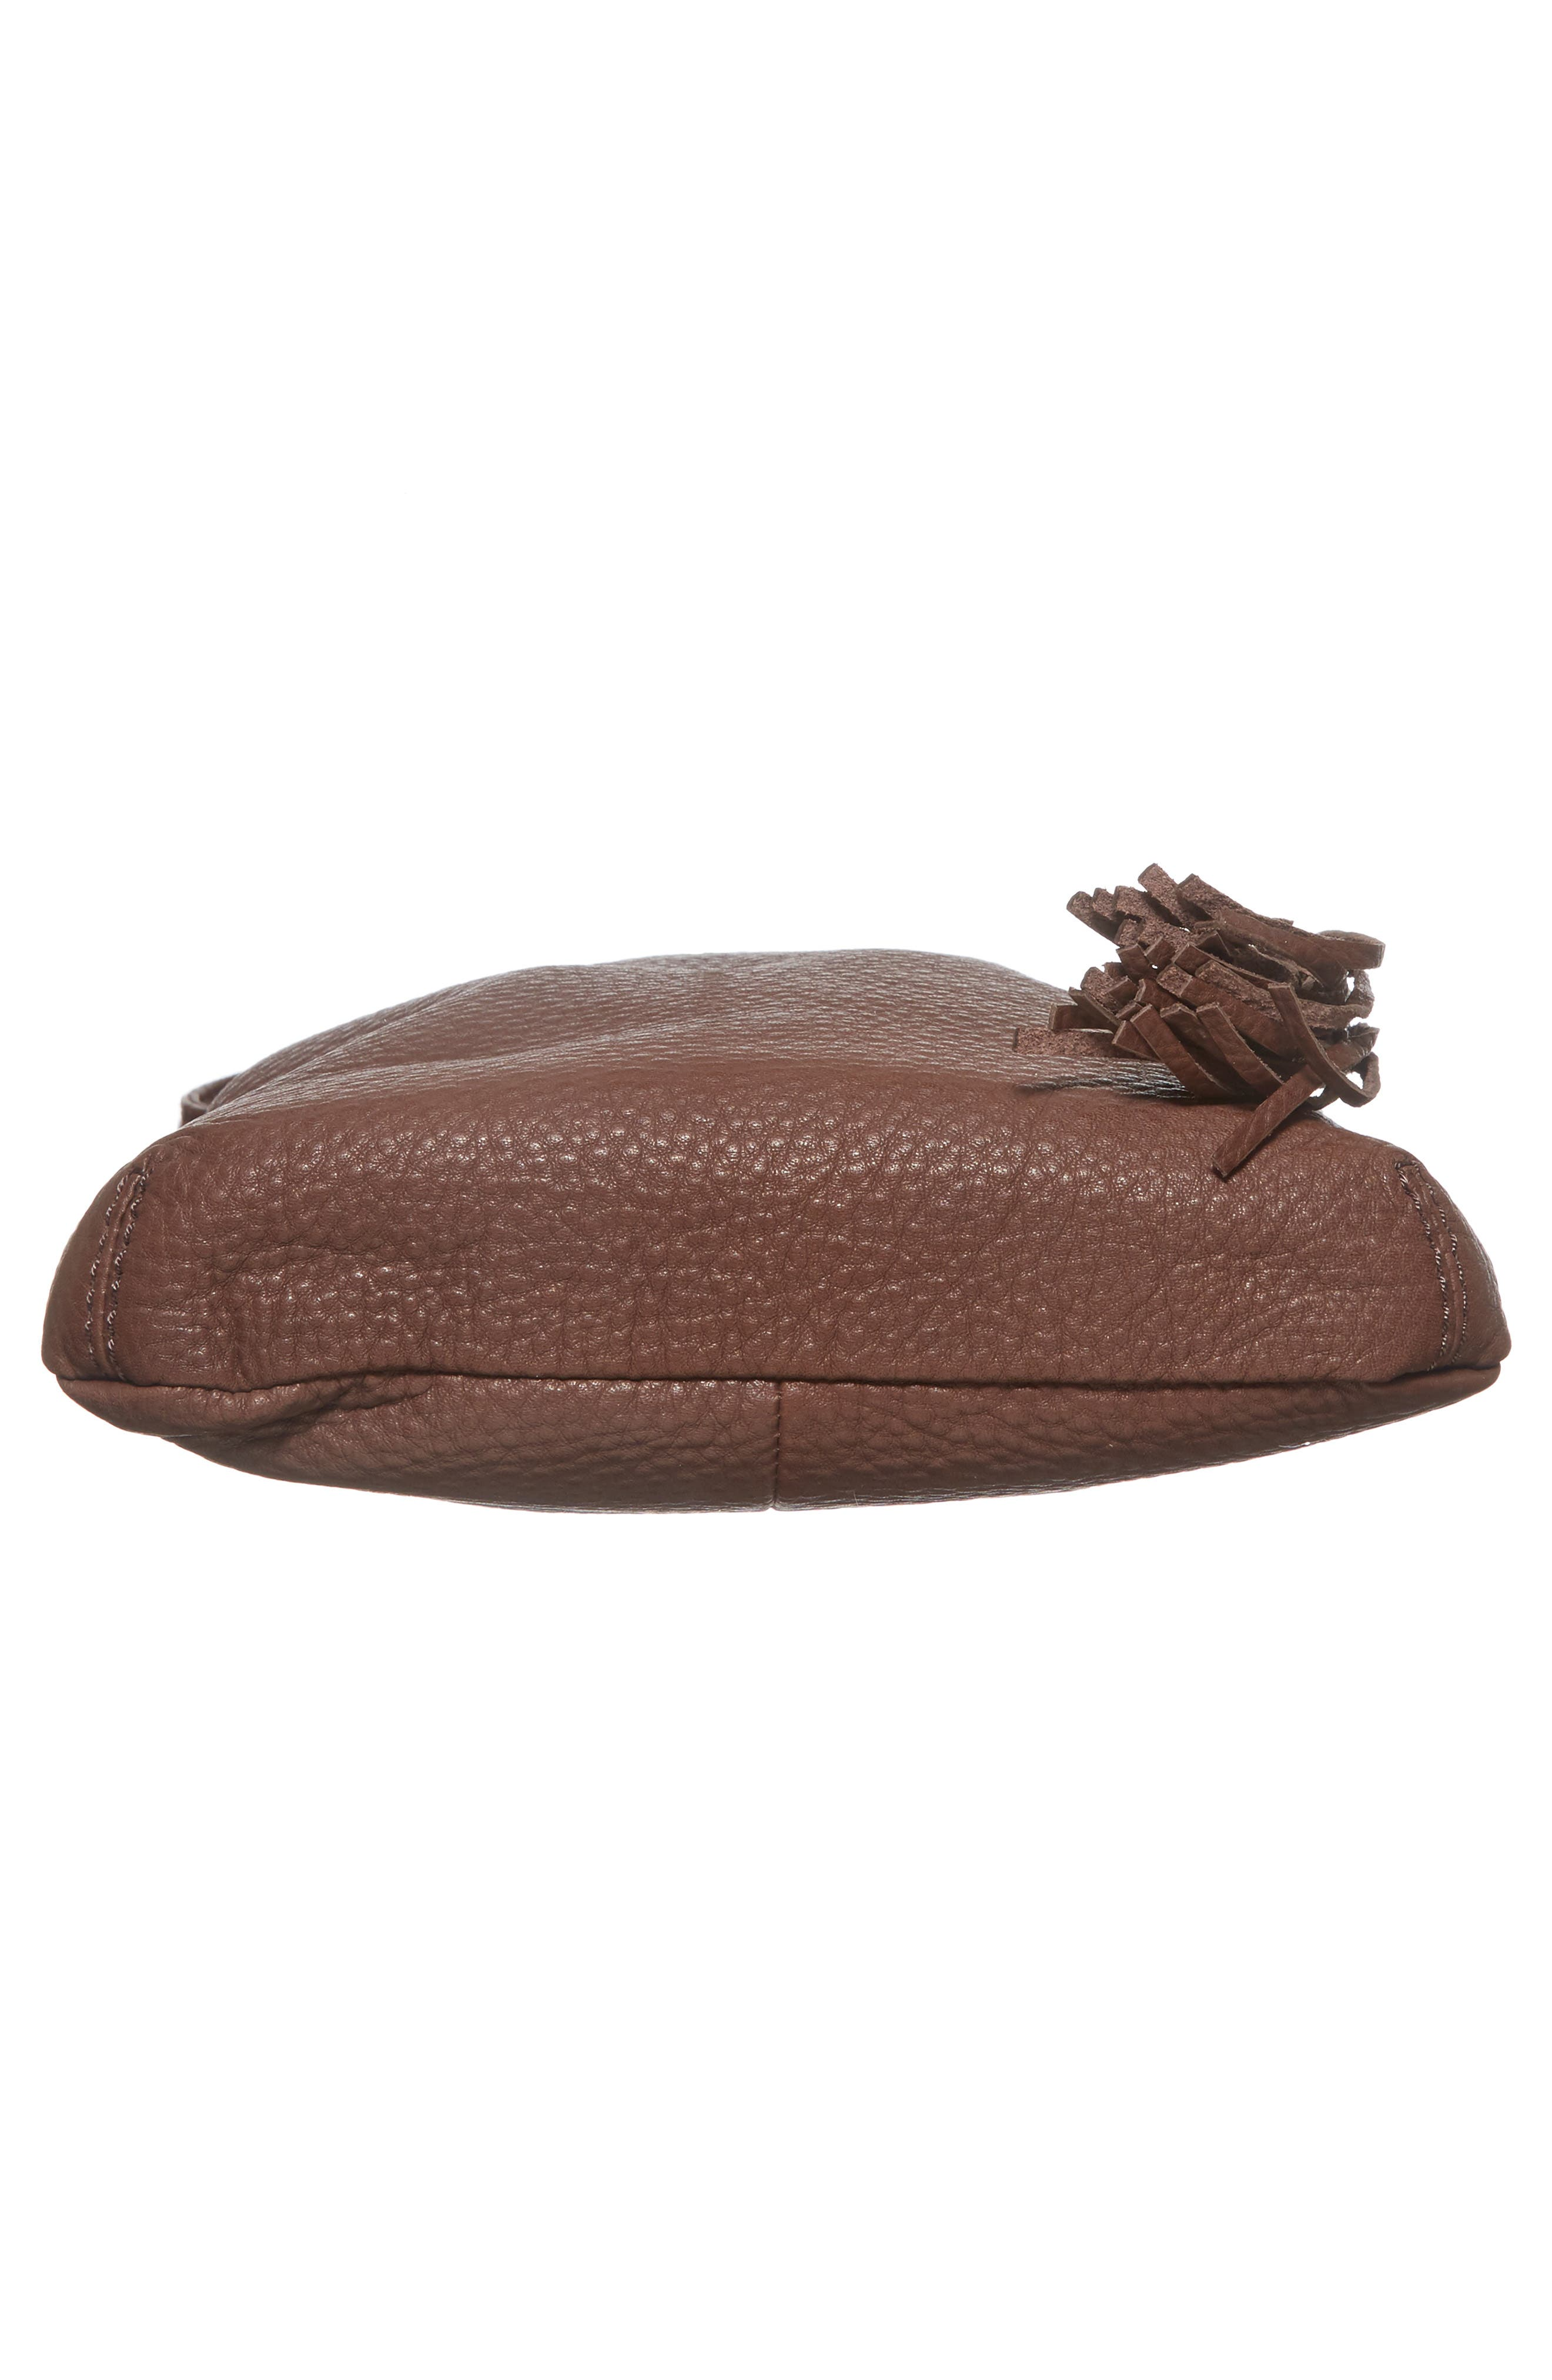 'Sarah' Leather Crossbody Bag,                             Alternate thumbnail 28, color,